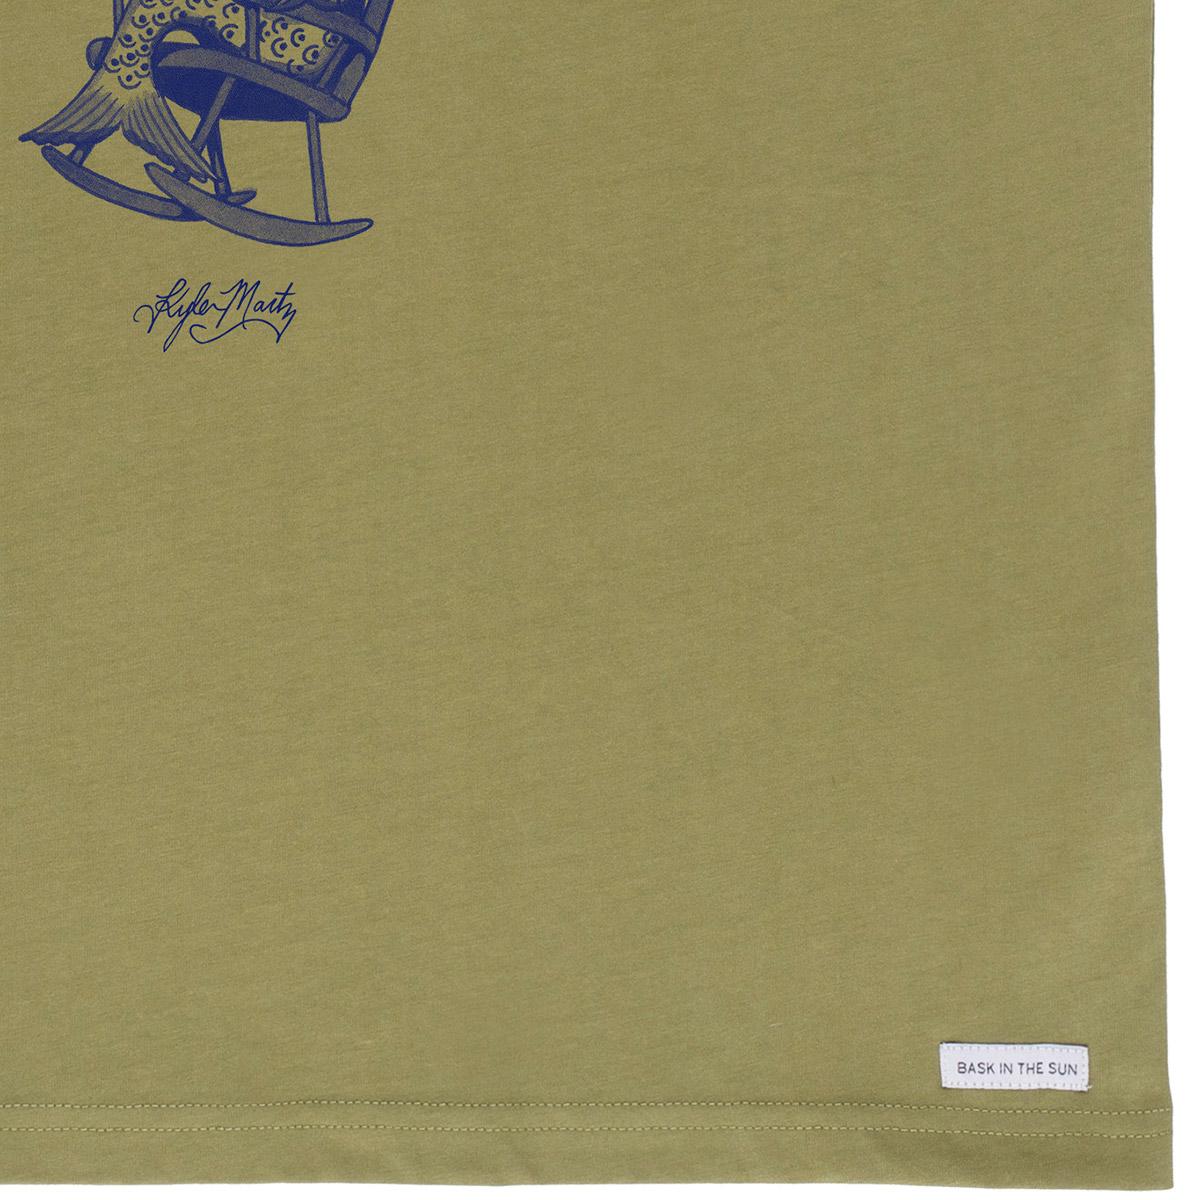 T-shirt en coton bio kaki smoking fish - Bask in the Sun num 3